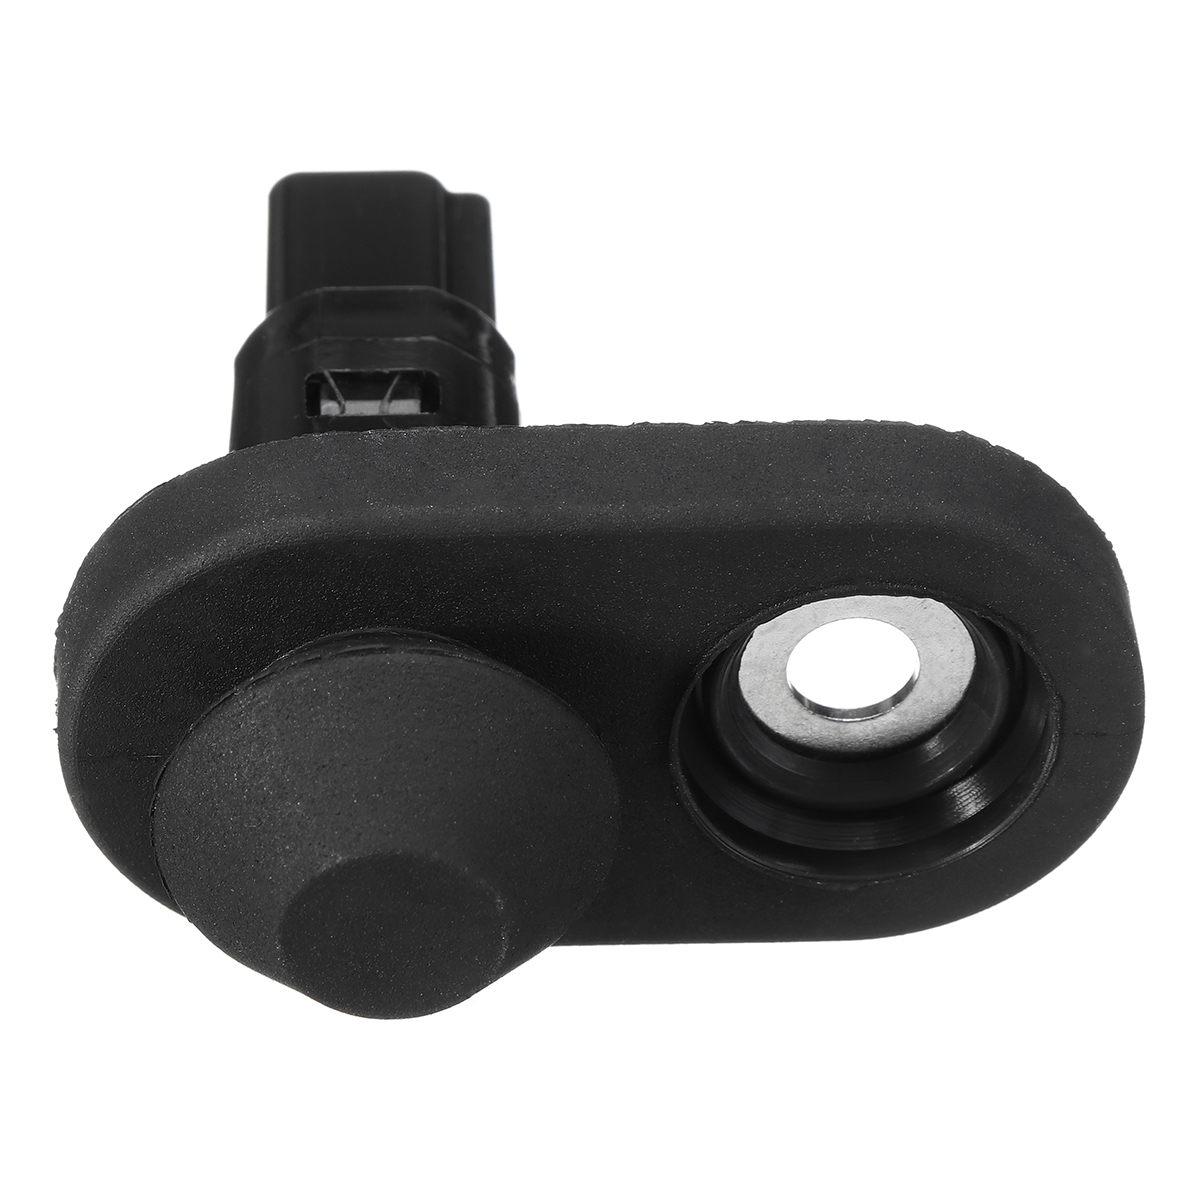 Door Courtesy Light Lamp Switch 84231-60070 for Lexus RX350 for Toyota /Camry 4Runner /Corolla RAV4 /Yaris Scion tC xB 84231-520